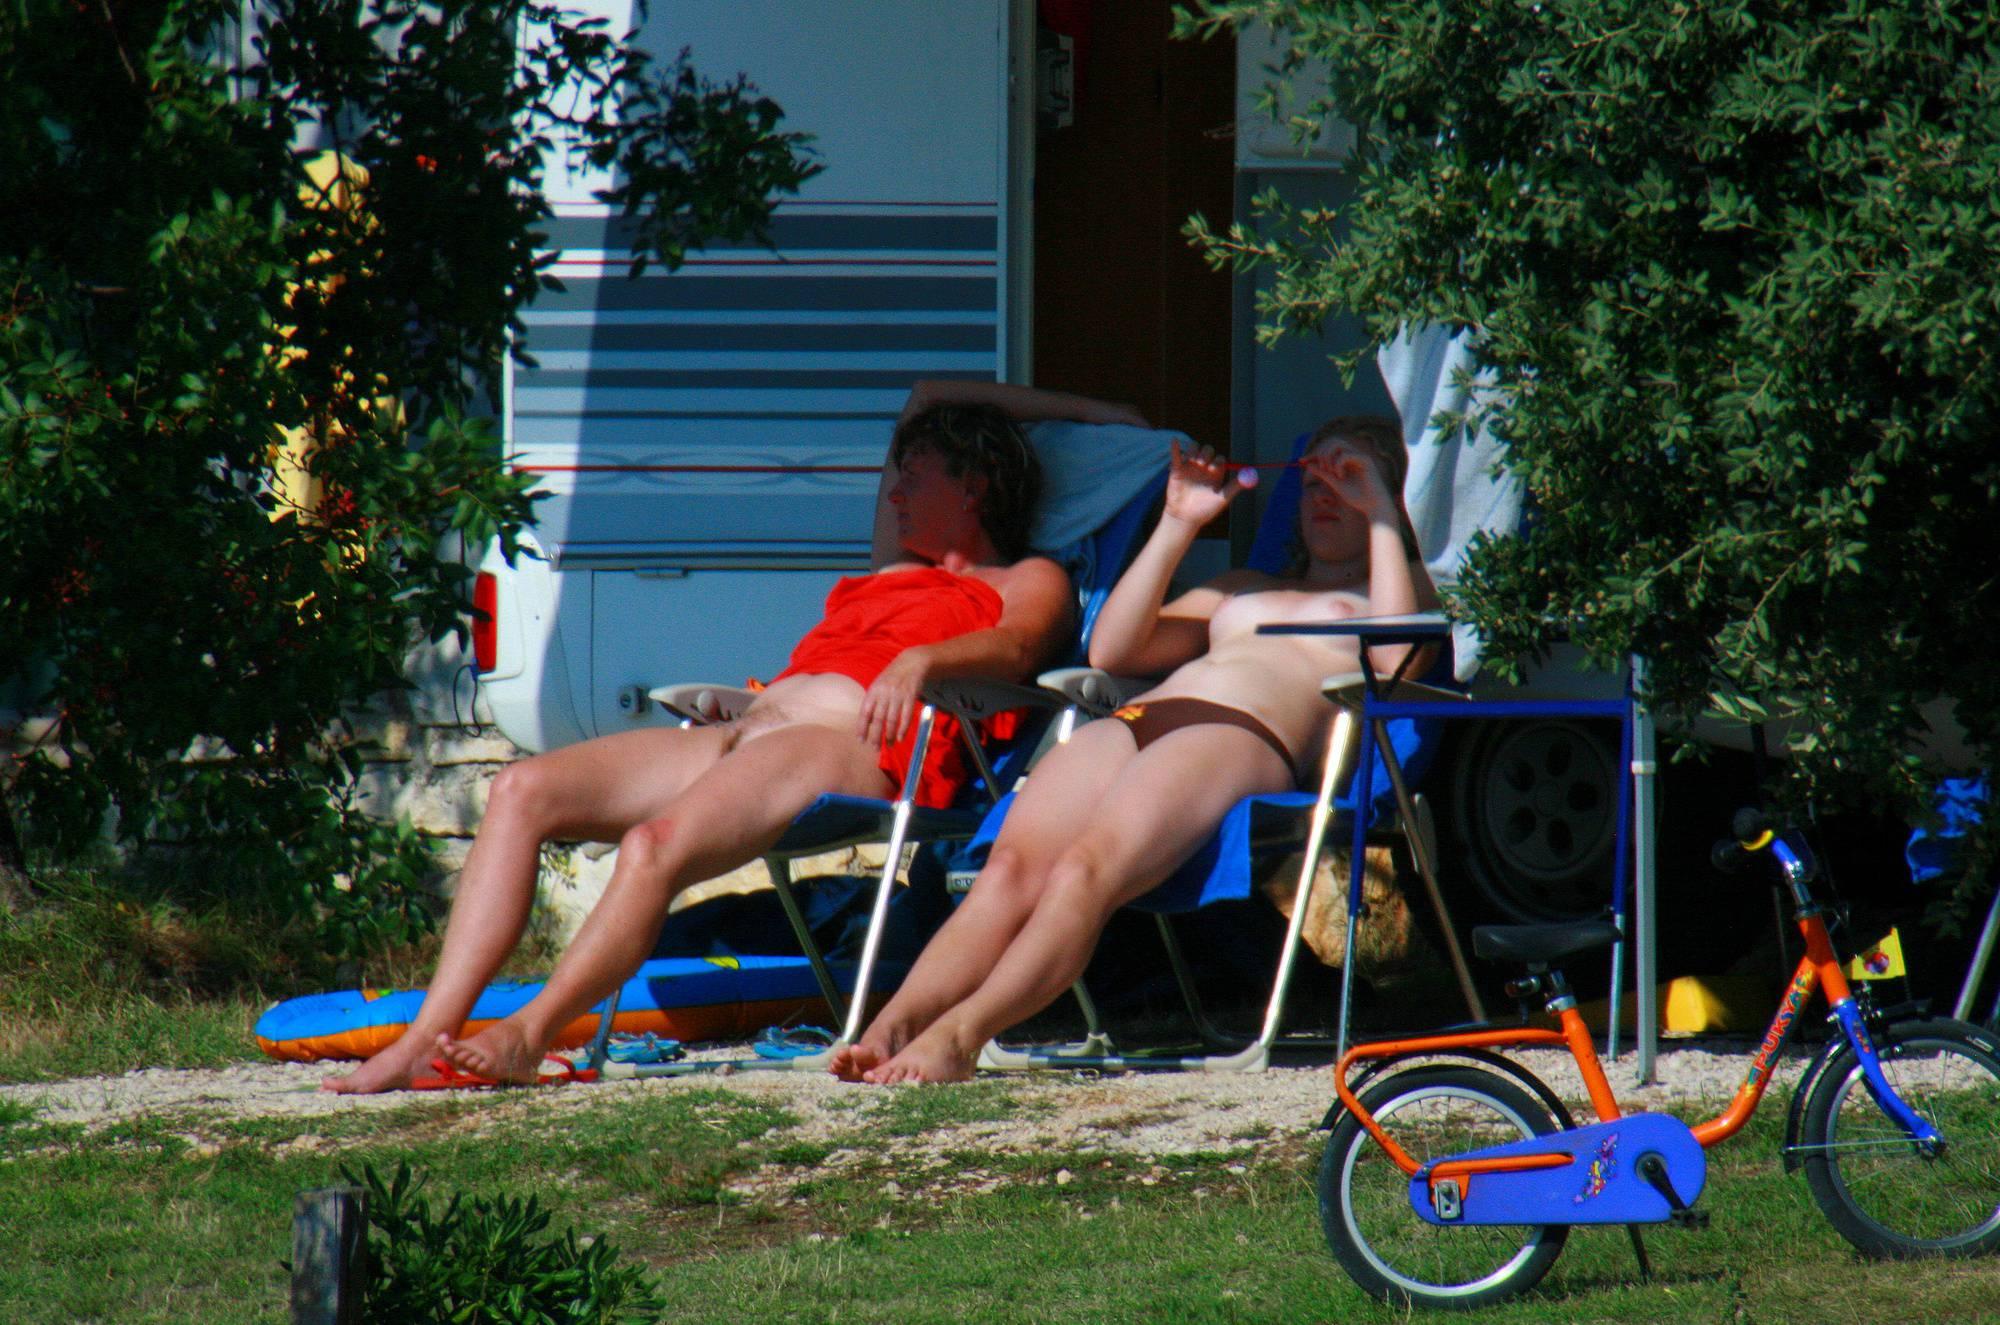 Ula FKK Camping Sites - 1